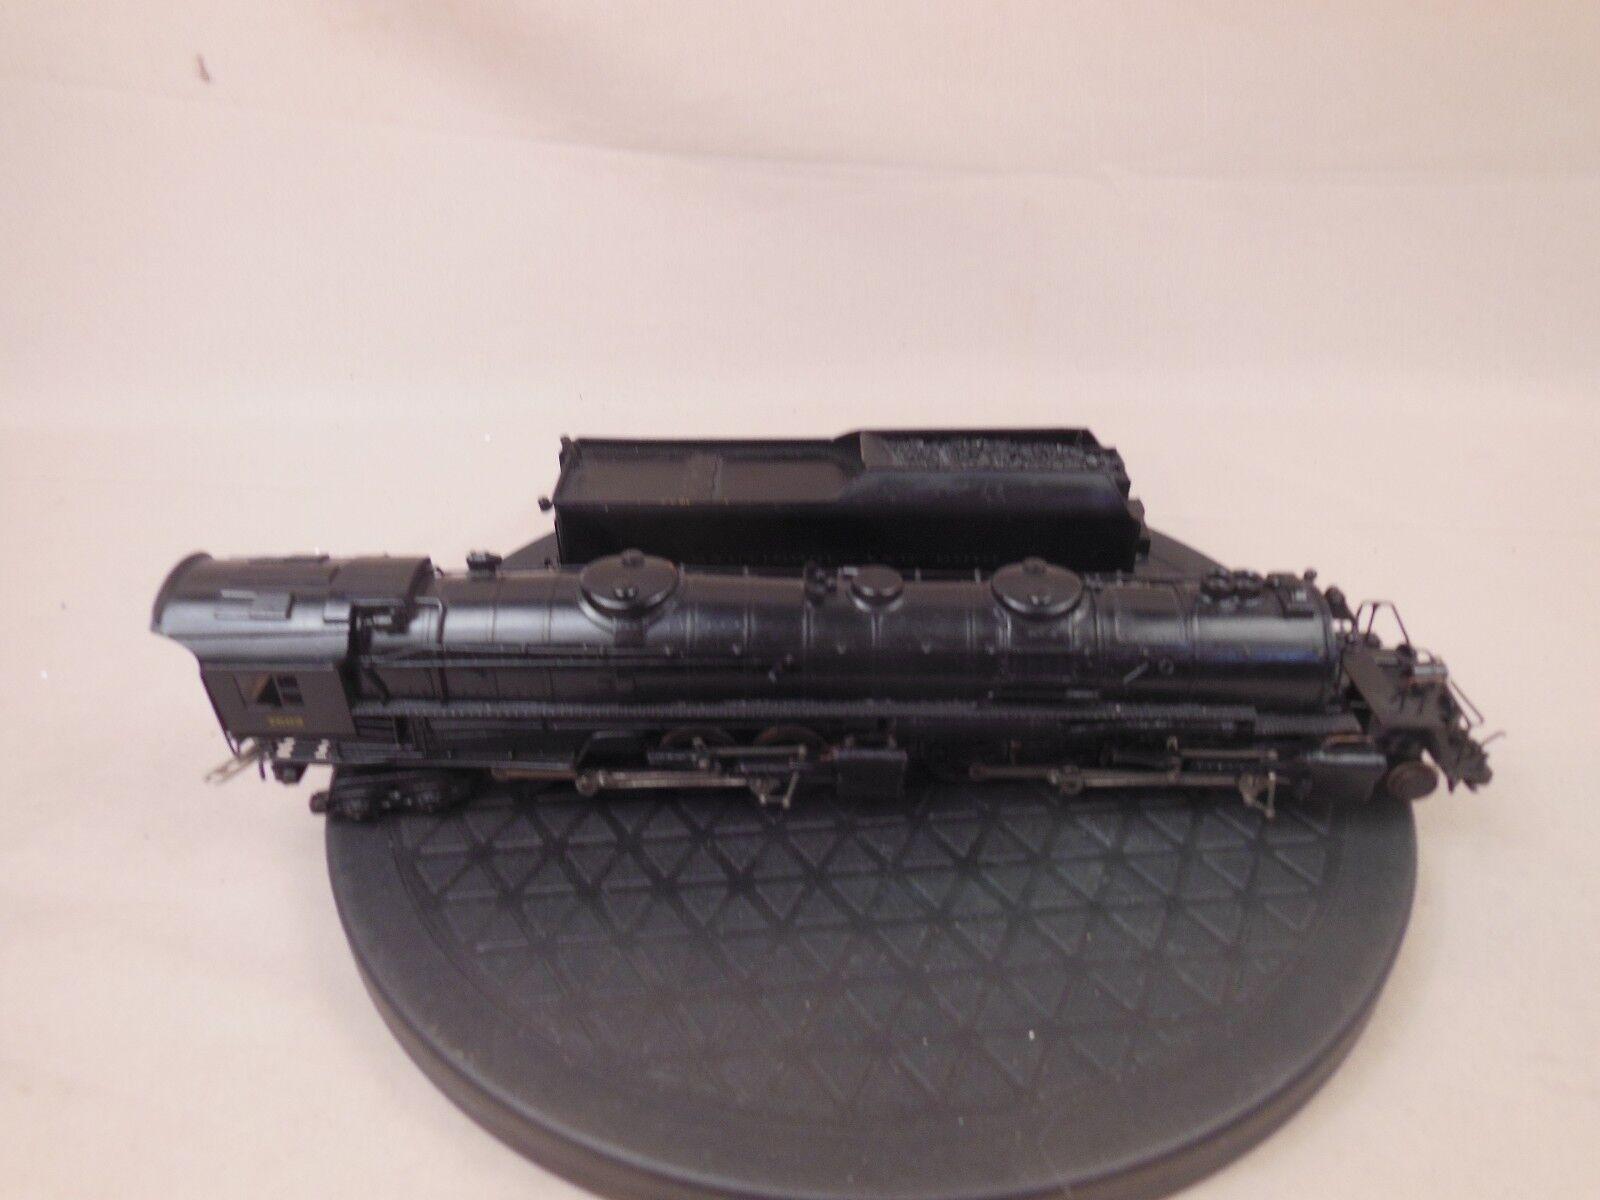 Latón réplica en escala HO Baltimore & Ohio EM-1 2-8-8-4 Locomotora articulada